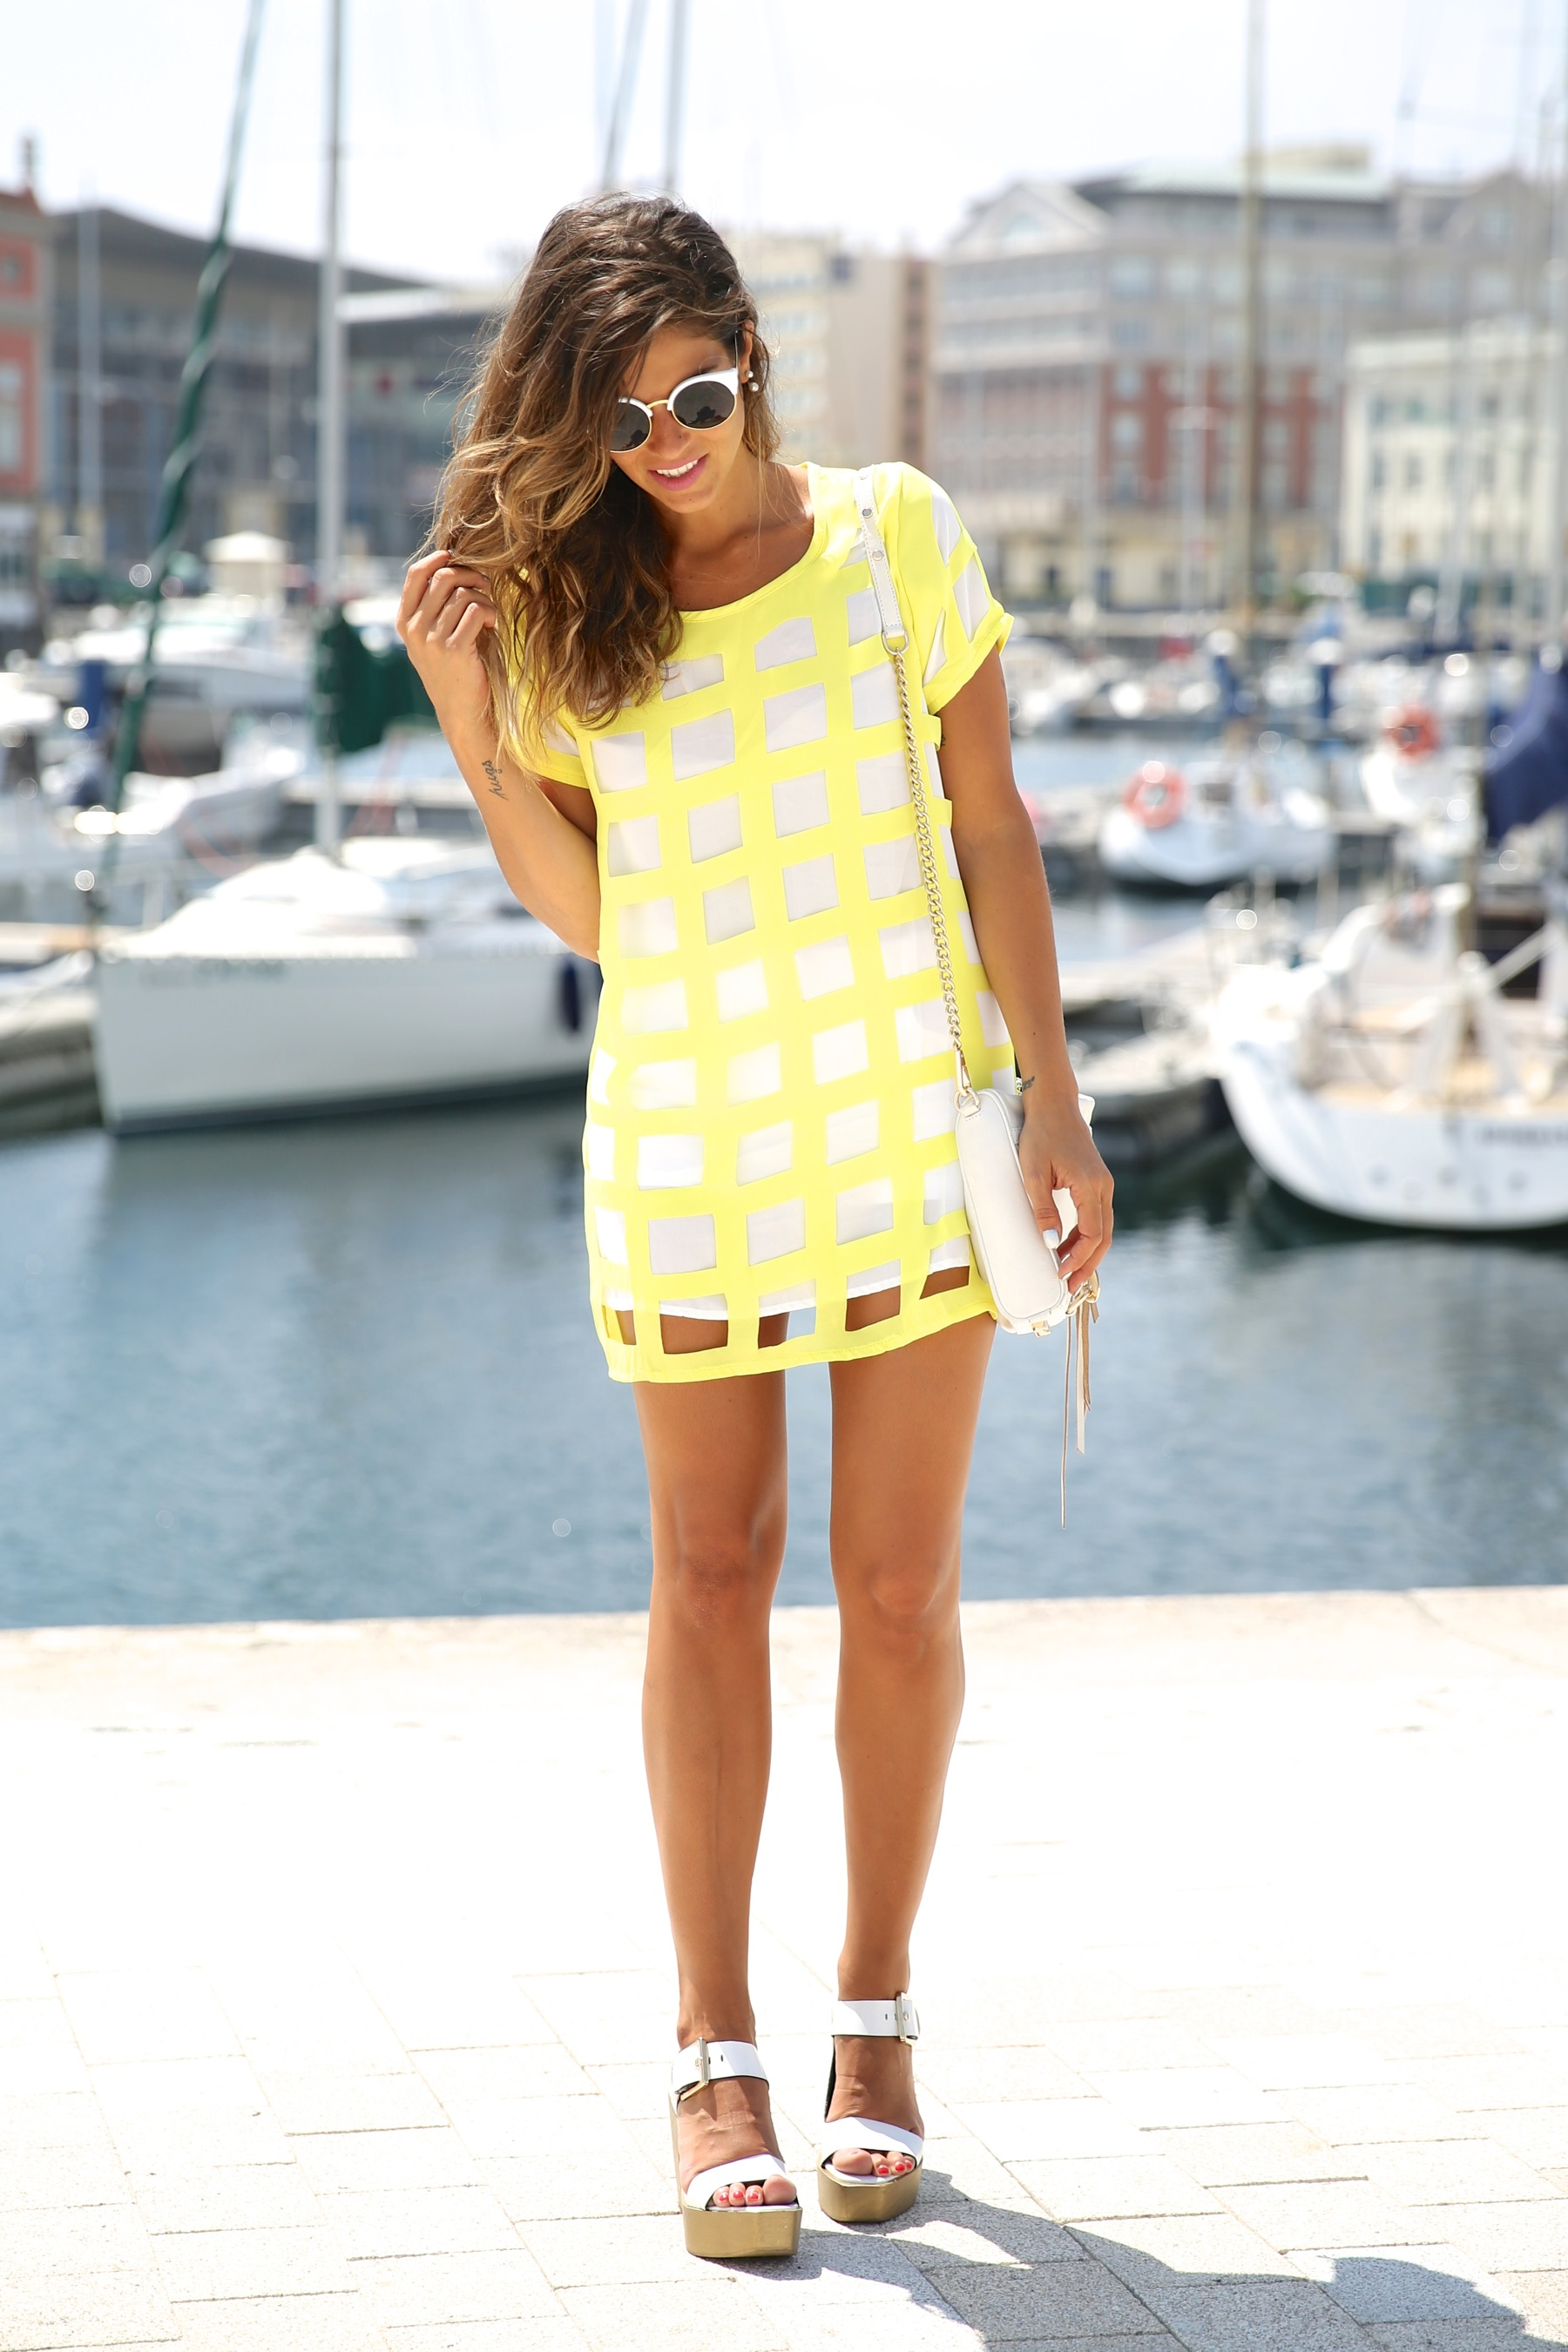 trendy_taste-look-outfit-street_style-ootd-blog-blogger-moda_españa-fashion_spain-coruña-galicia-sandalias_plataforma-platform_sandals-rebecca_minkoff-yellow-amarillo-vestido-dress-plaid-cuadros-11